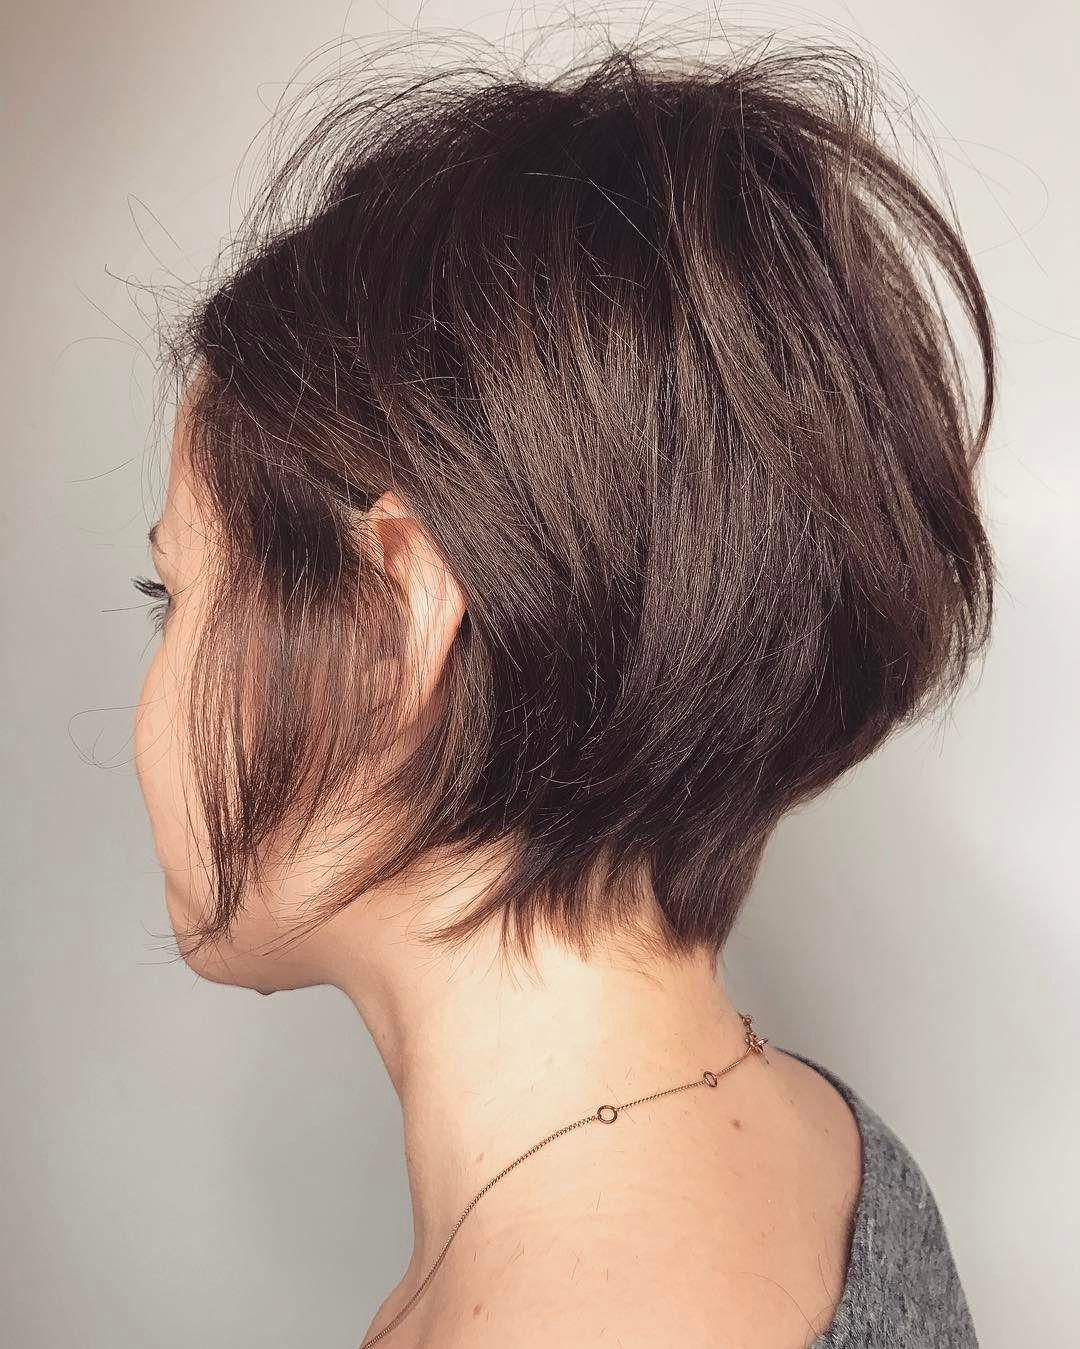 save find haircut